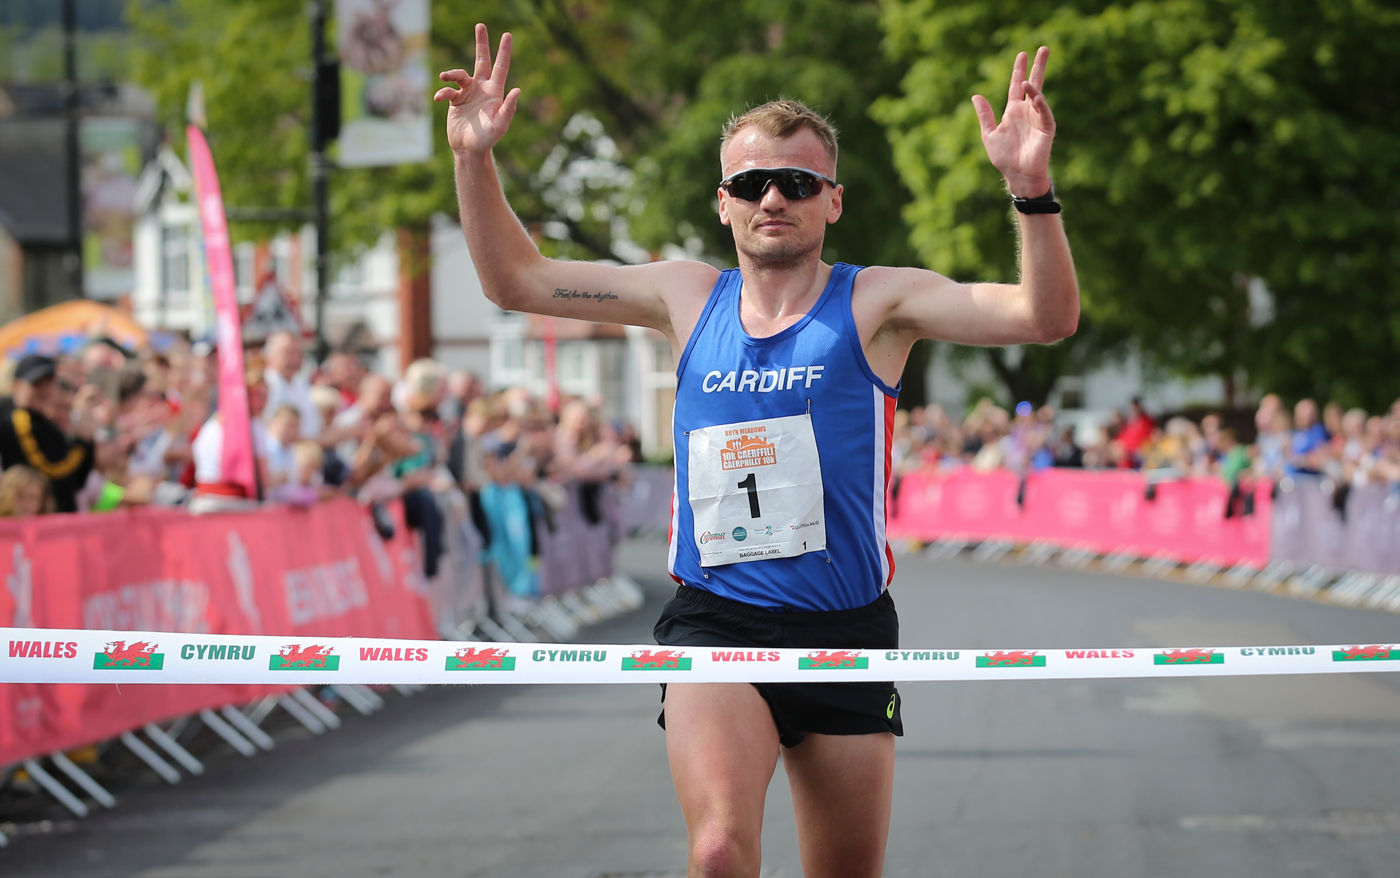 2019 Caerphilly 10k winner, Matt Clowes